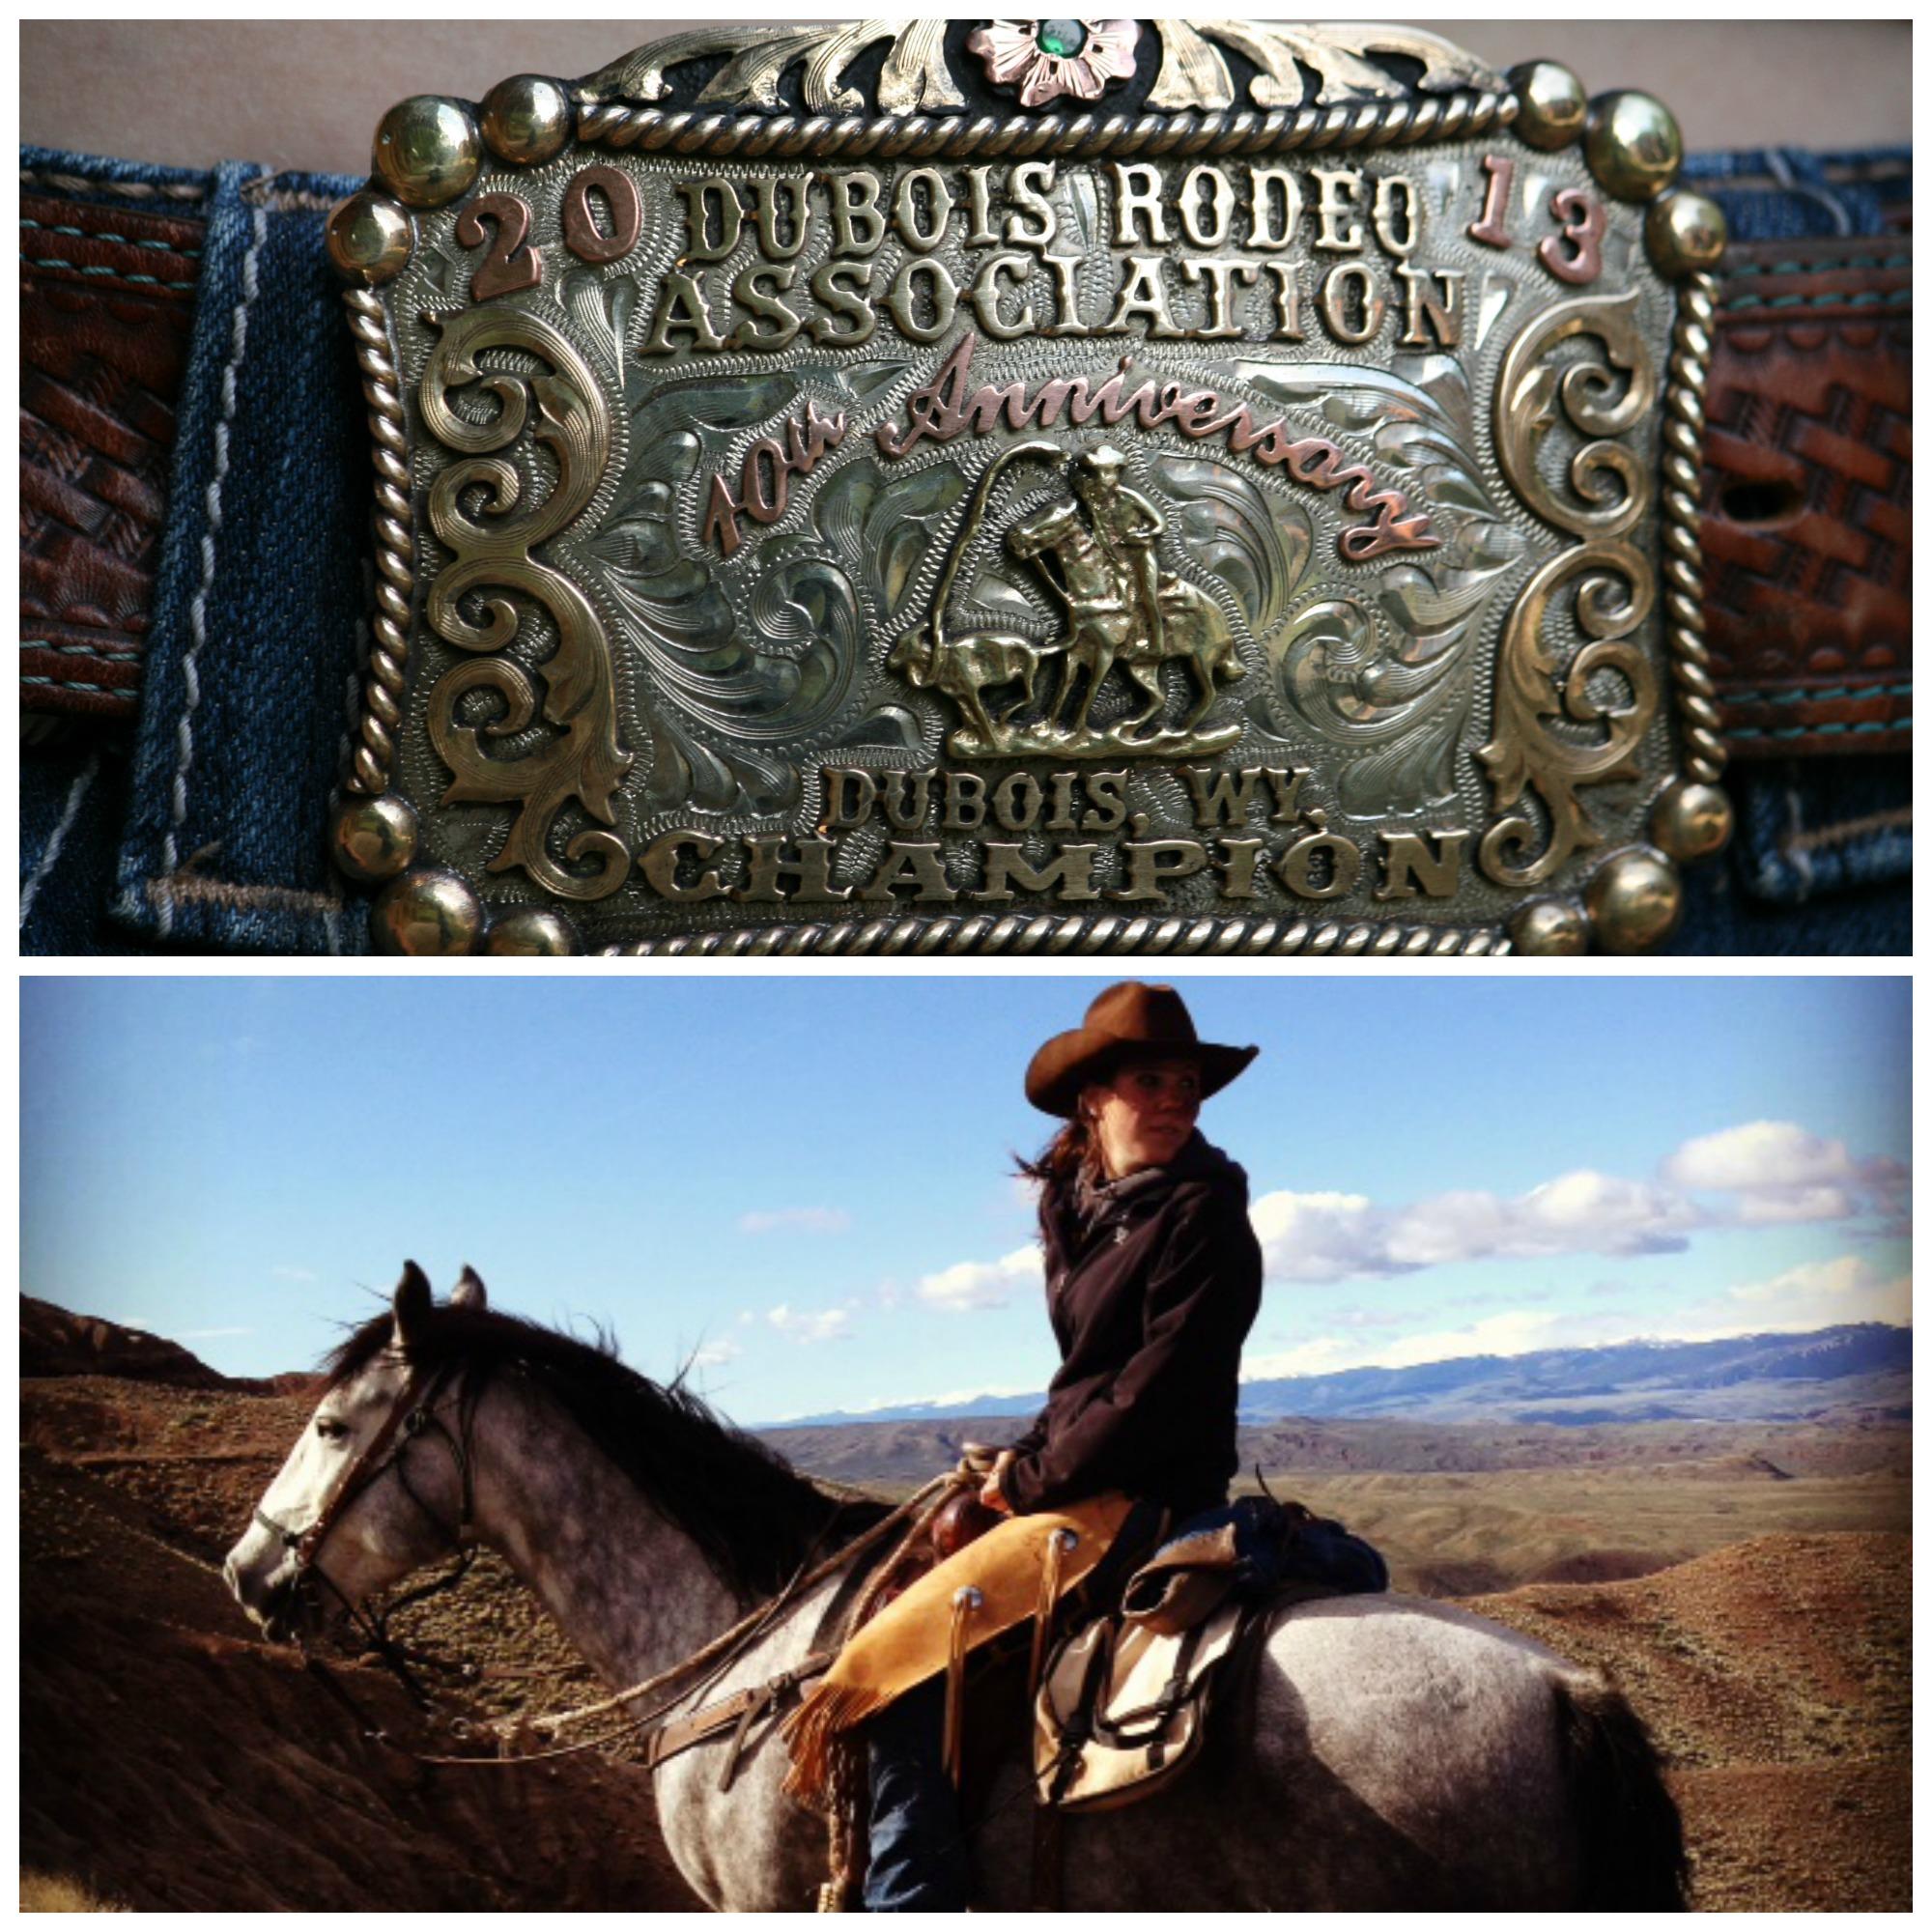 2013 Dubois Rodeo Champion